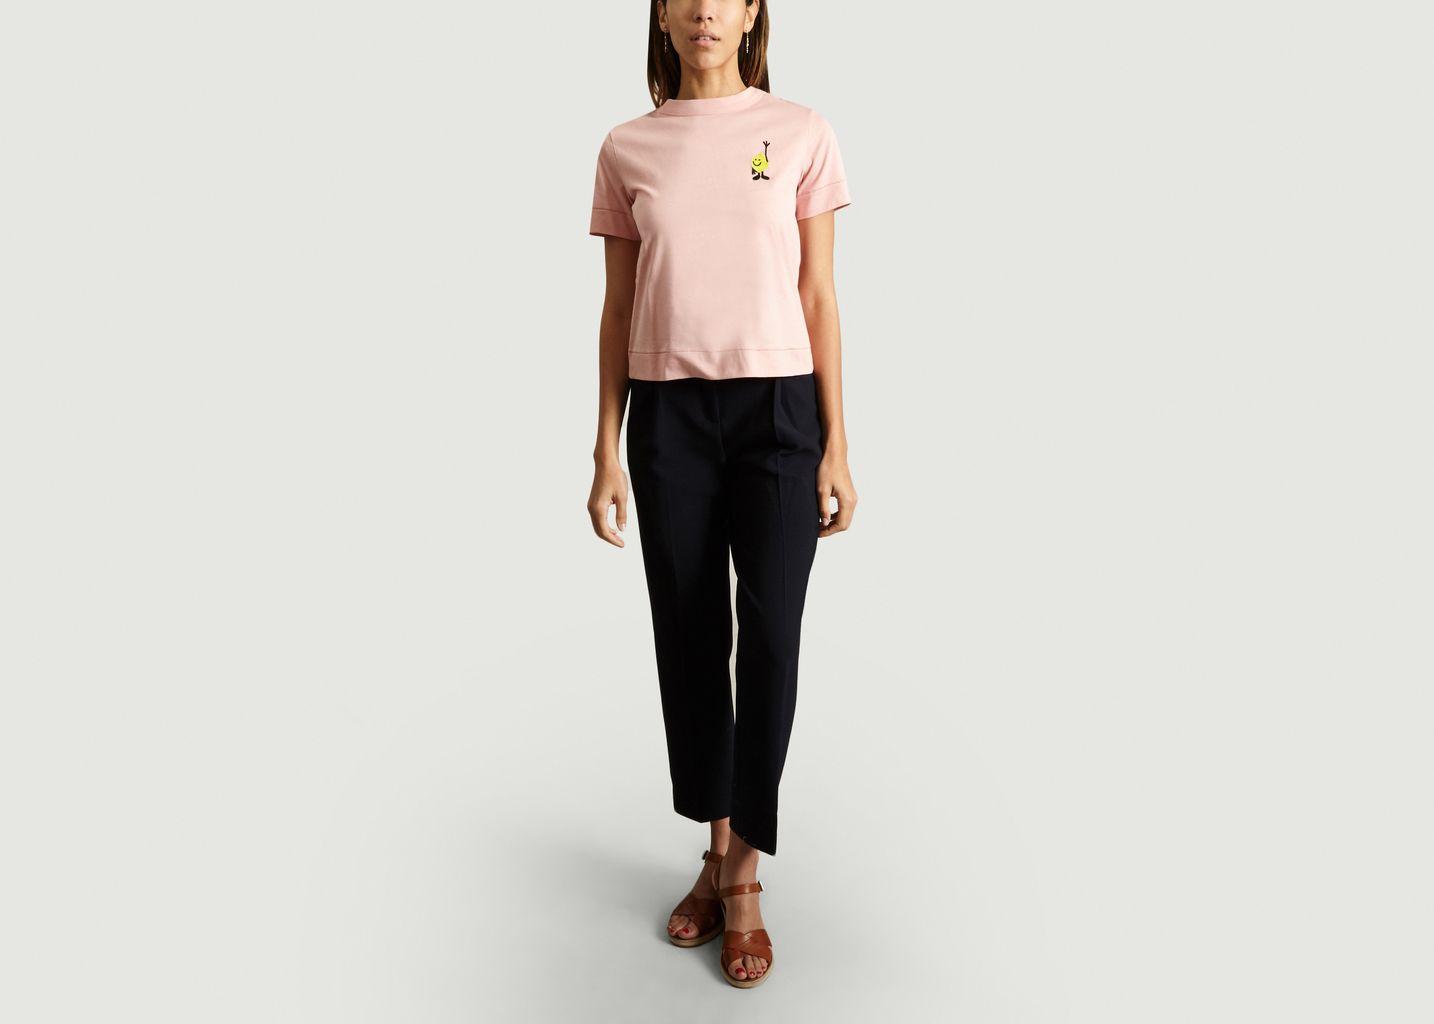 T-shirt Lemon - Loreak